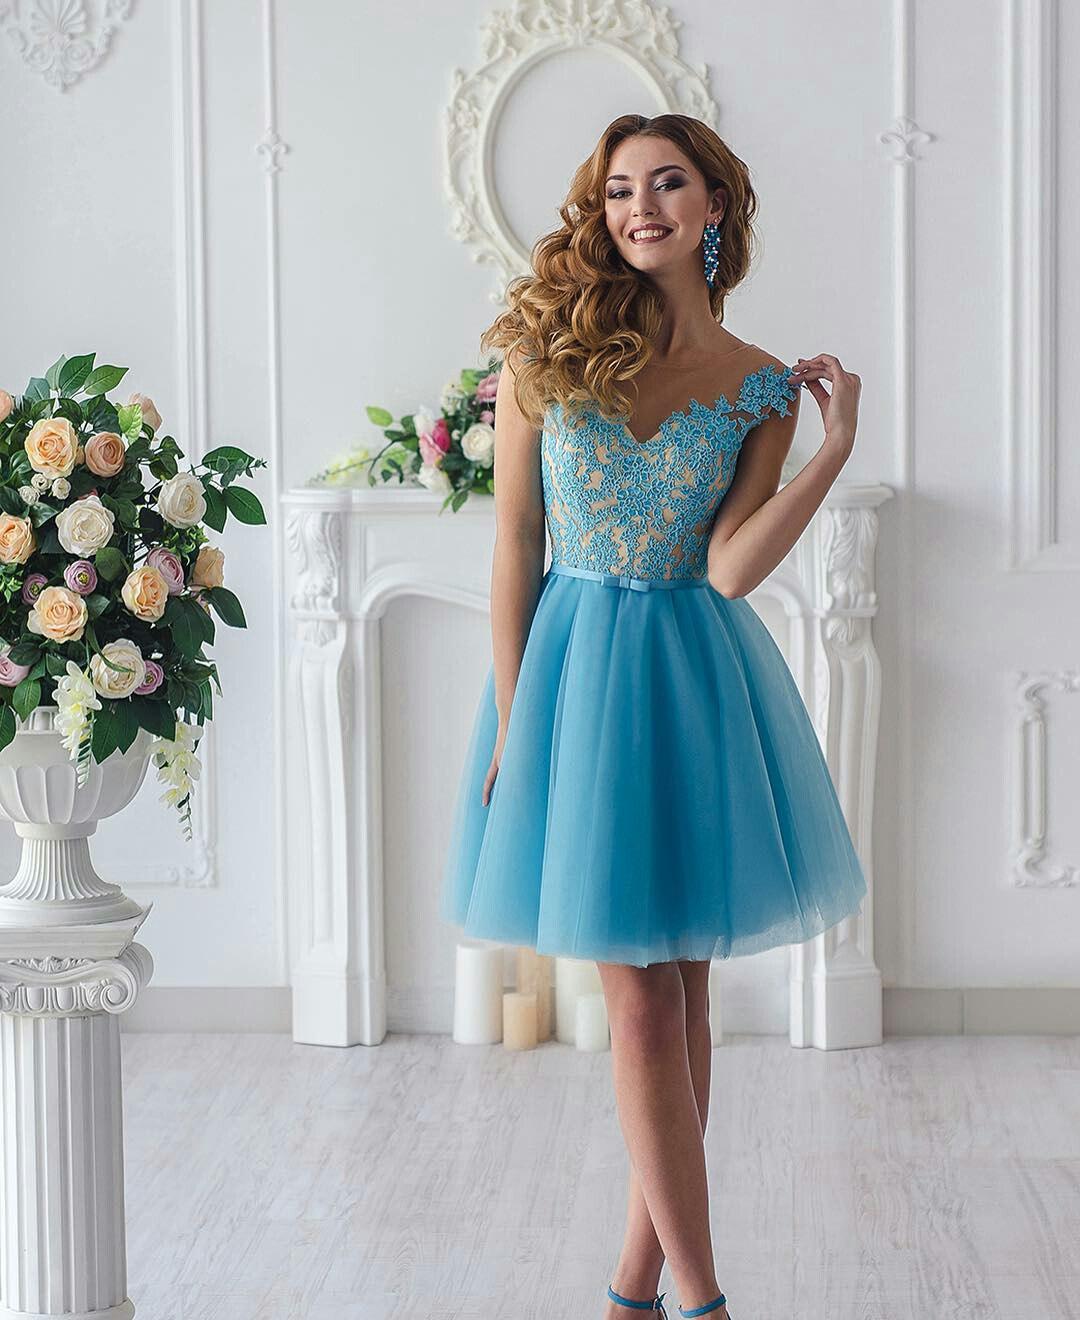 Short Evening Dresses: Women\'s Short Evening Gowns   LadyLife